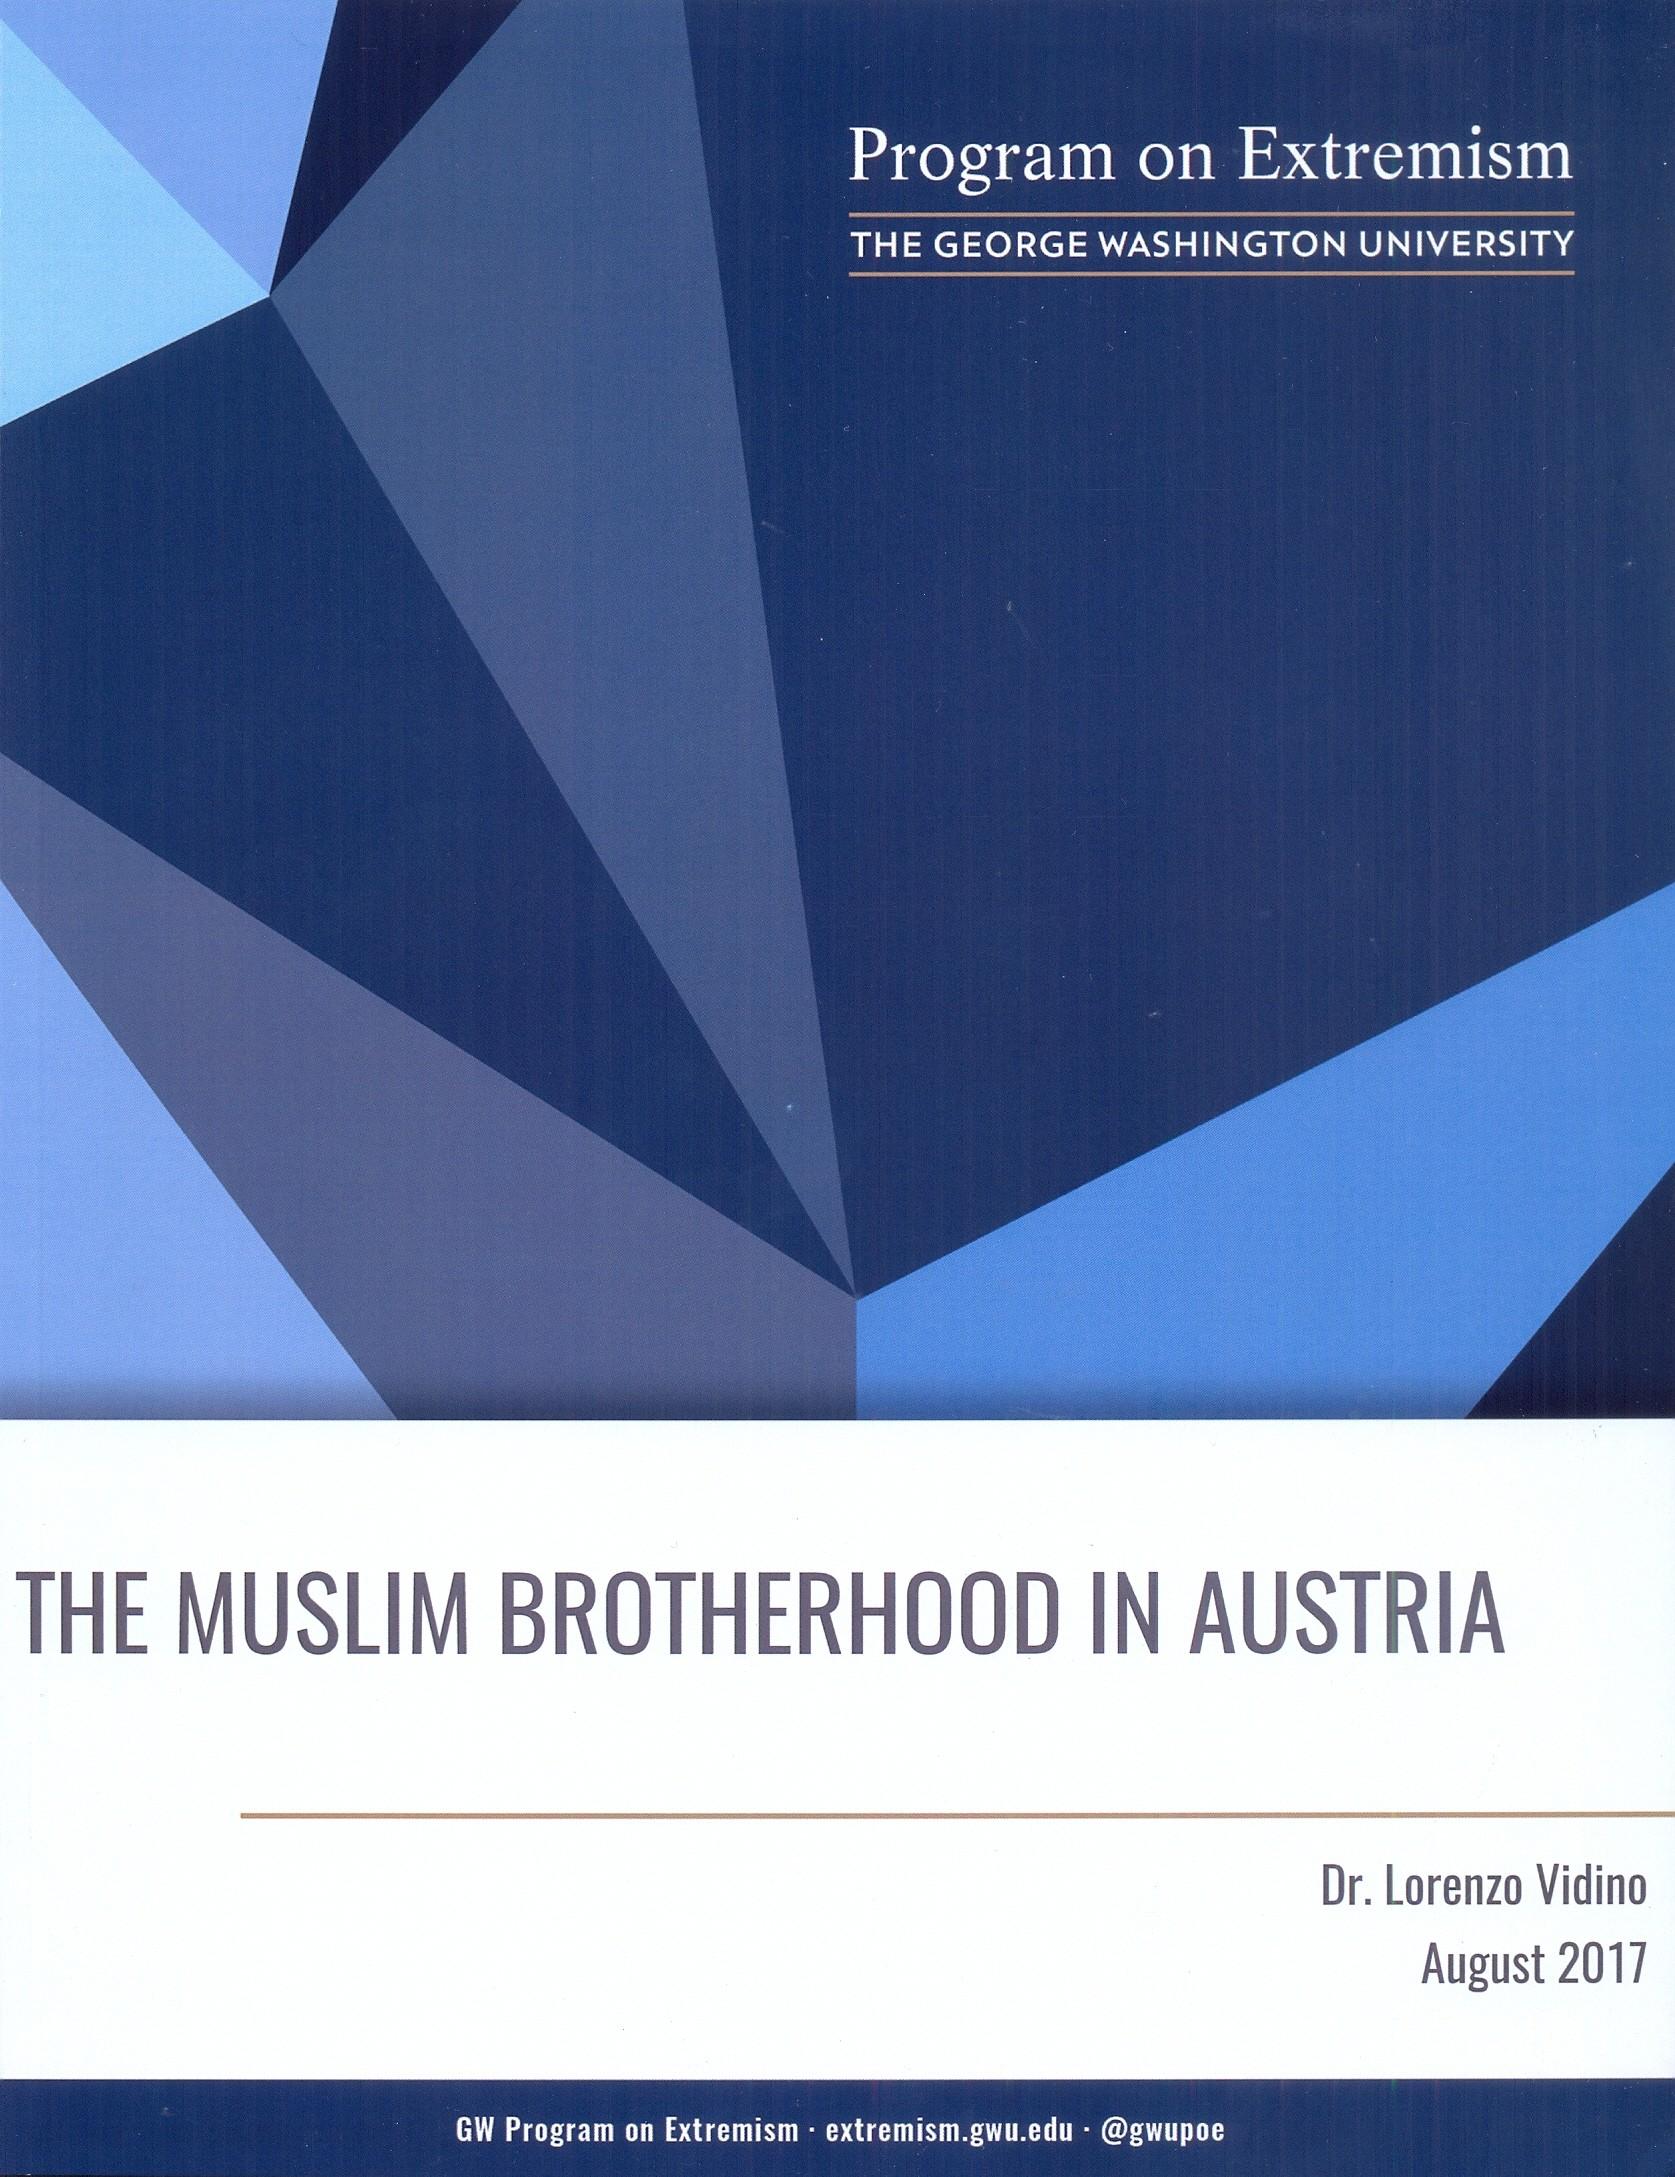 The muslim brotherhood in Austria